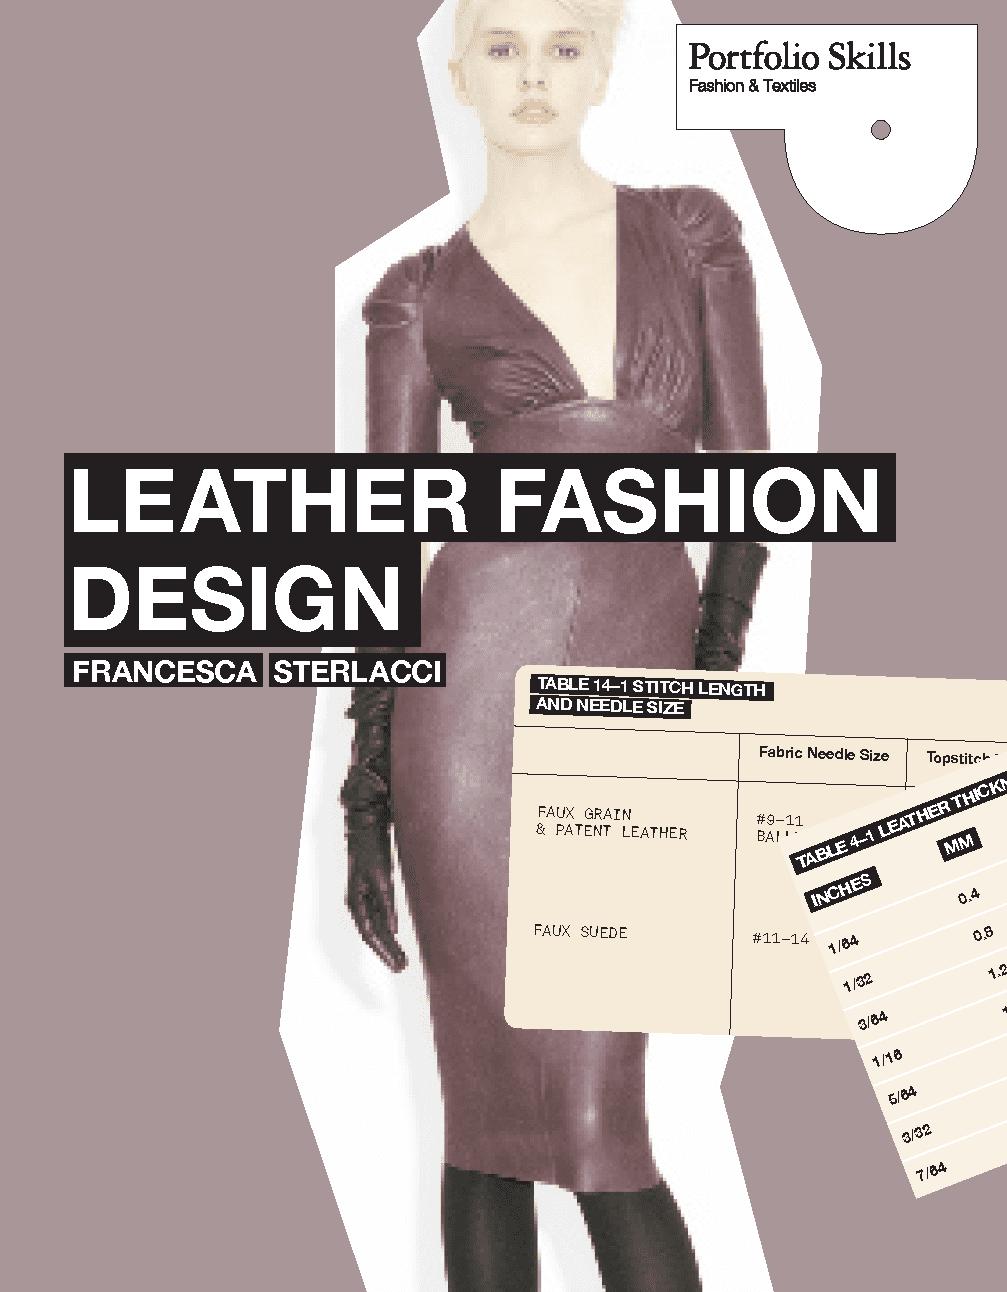 Leather Fashion Design - Product Thumbnail